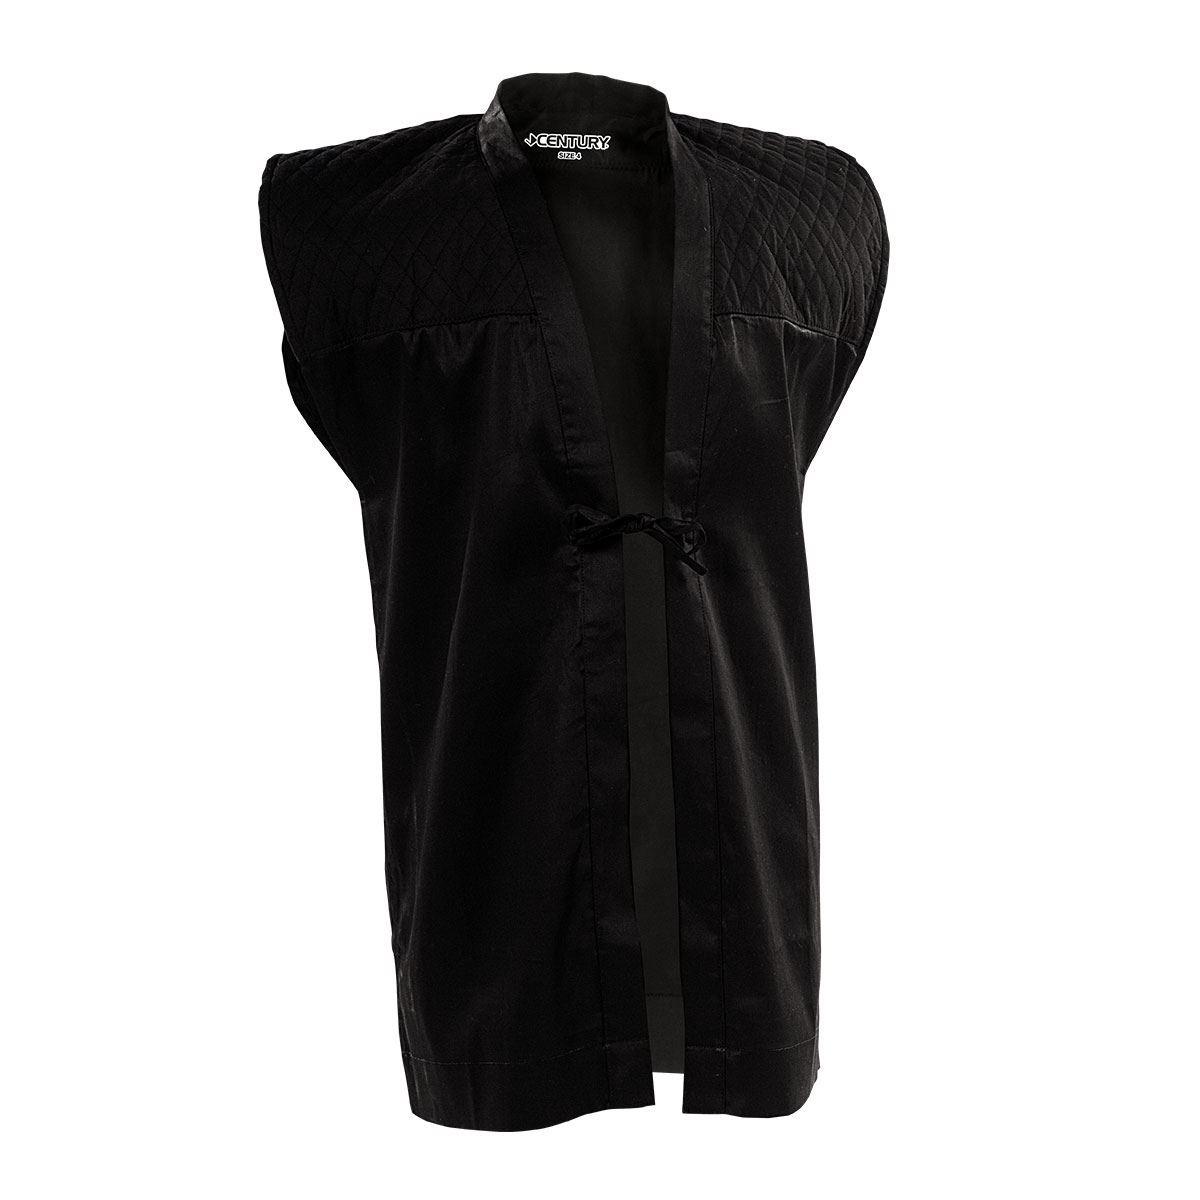 Kimono Martial Arts Karate Vest